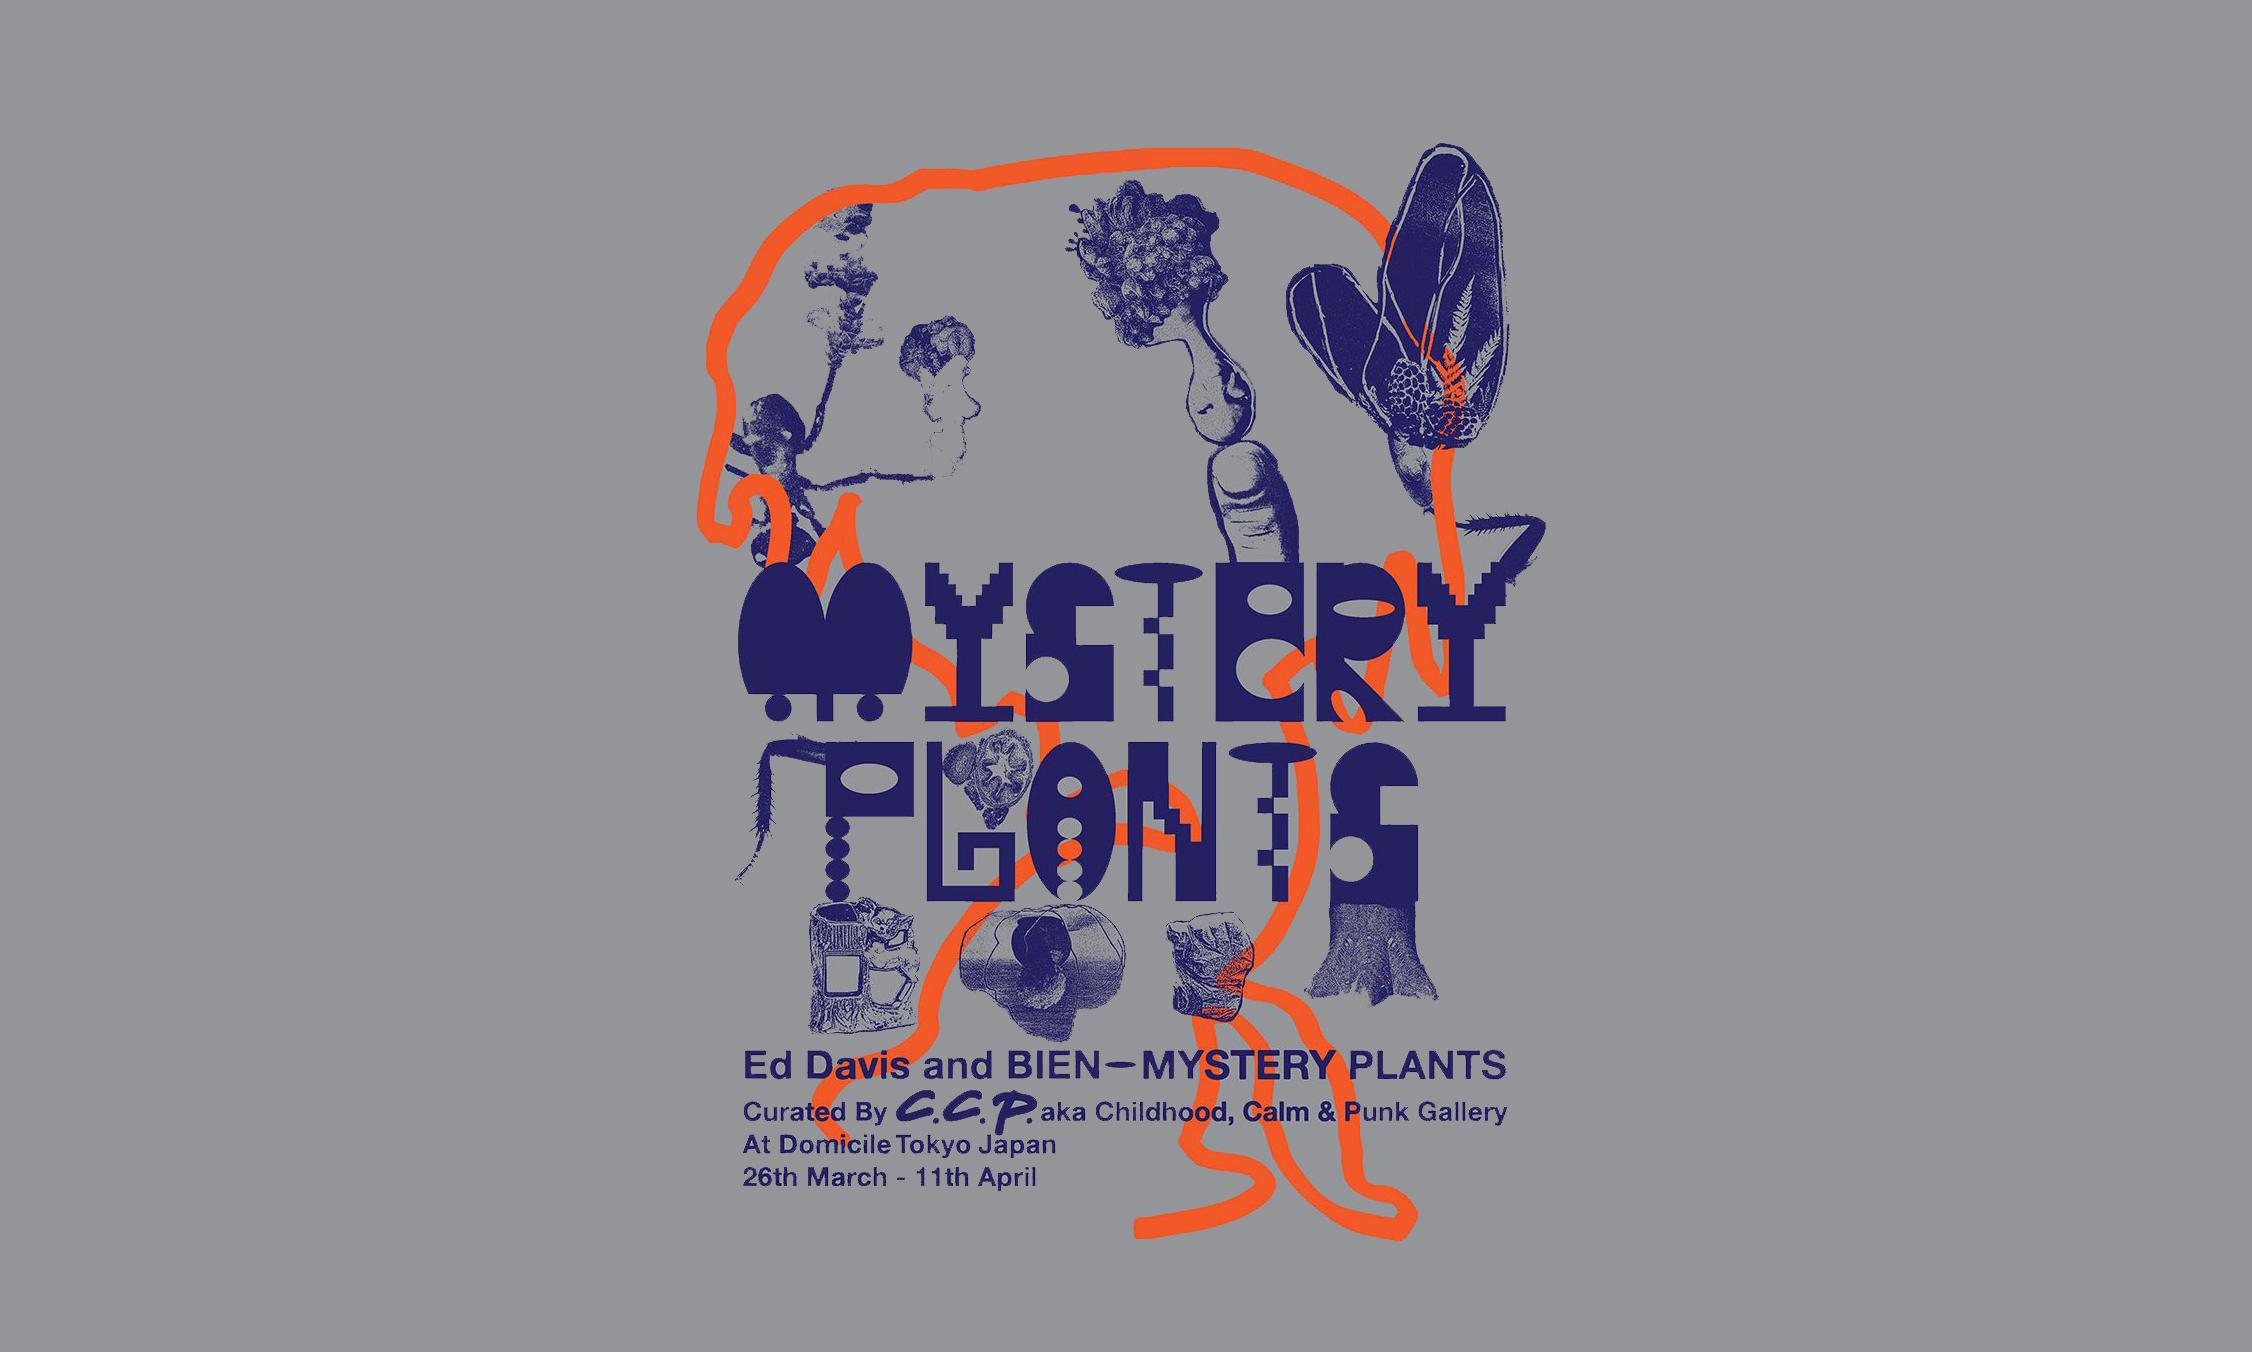 Brain Dead 主理人 Ed Davis 艺术展《MYSTERY PLANTS》即将开催